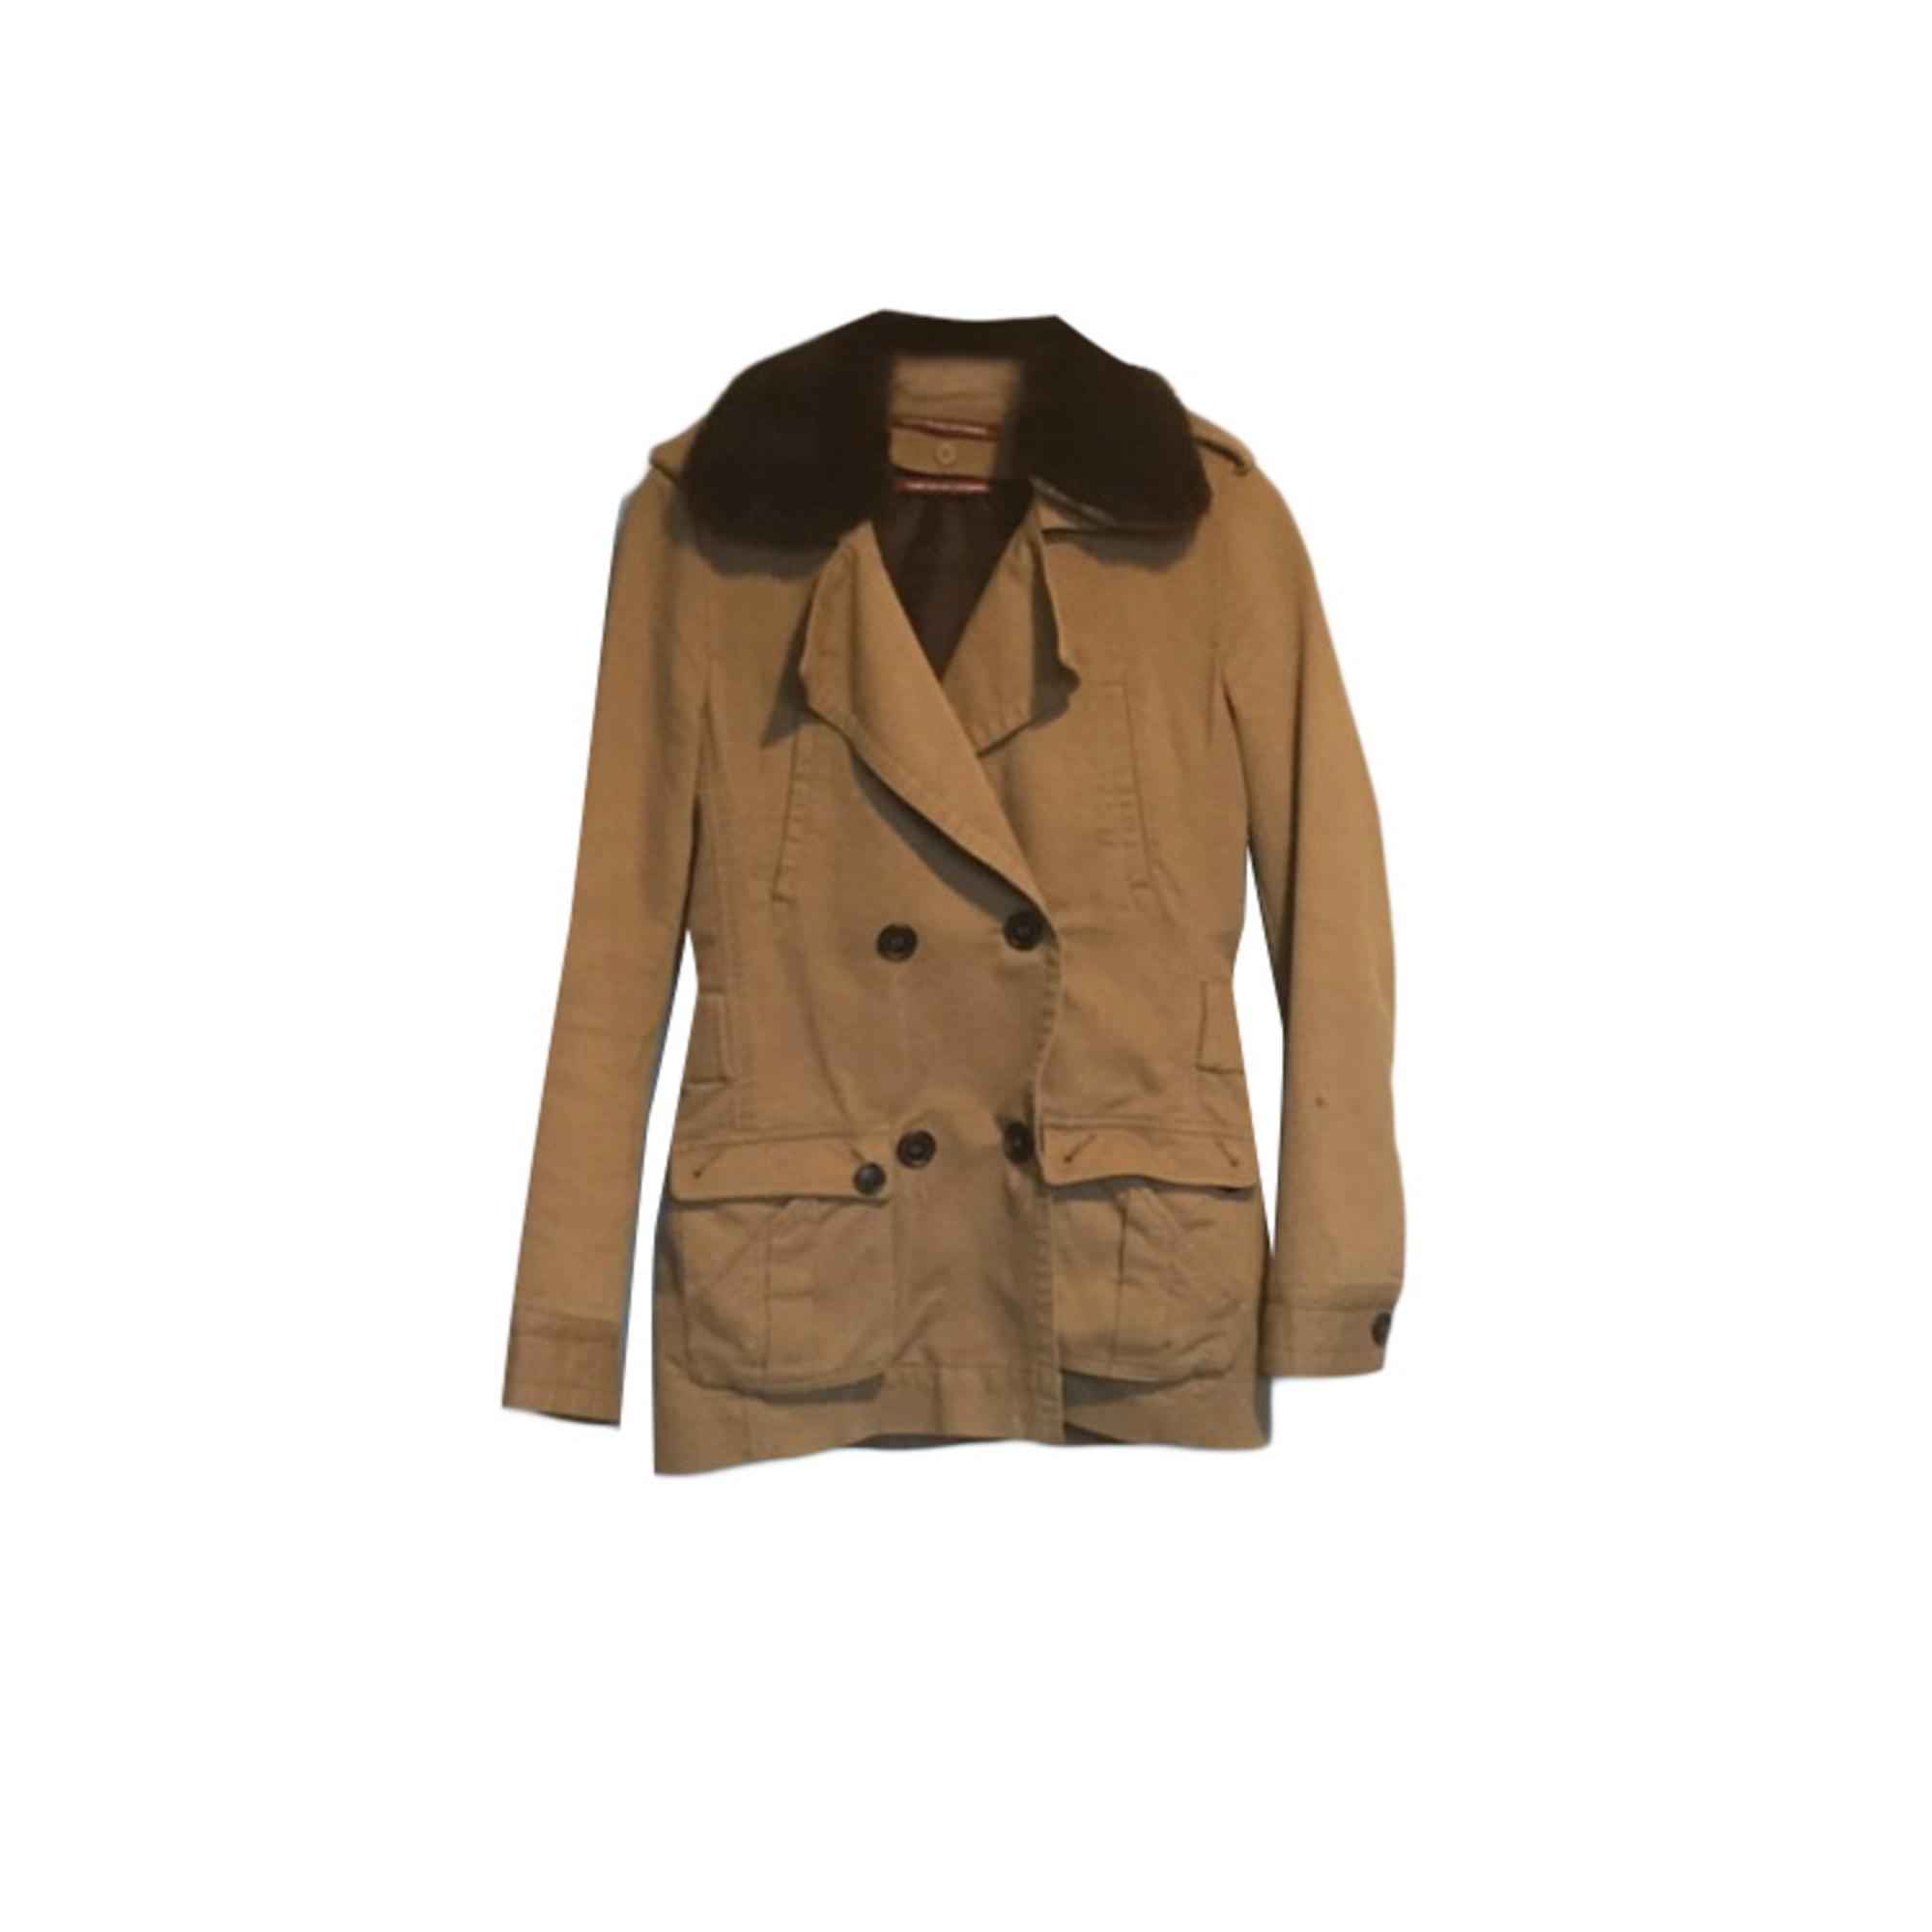 Coat COMPTOIR DES COTONNIERS Beige, camel